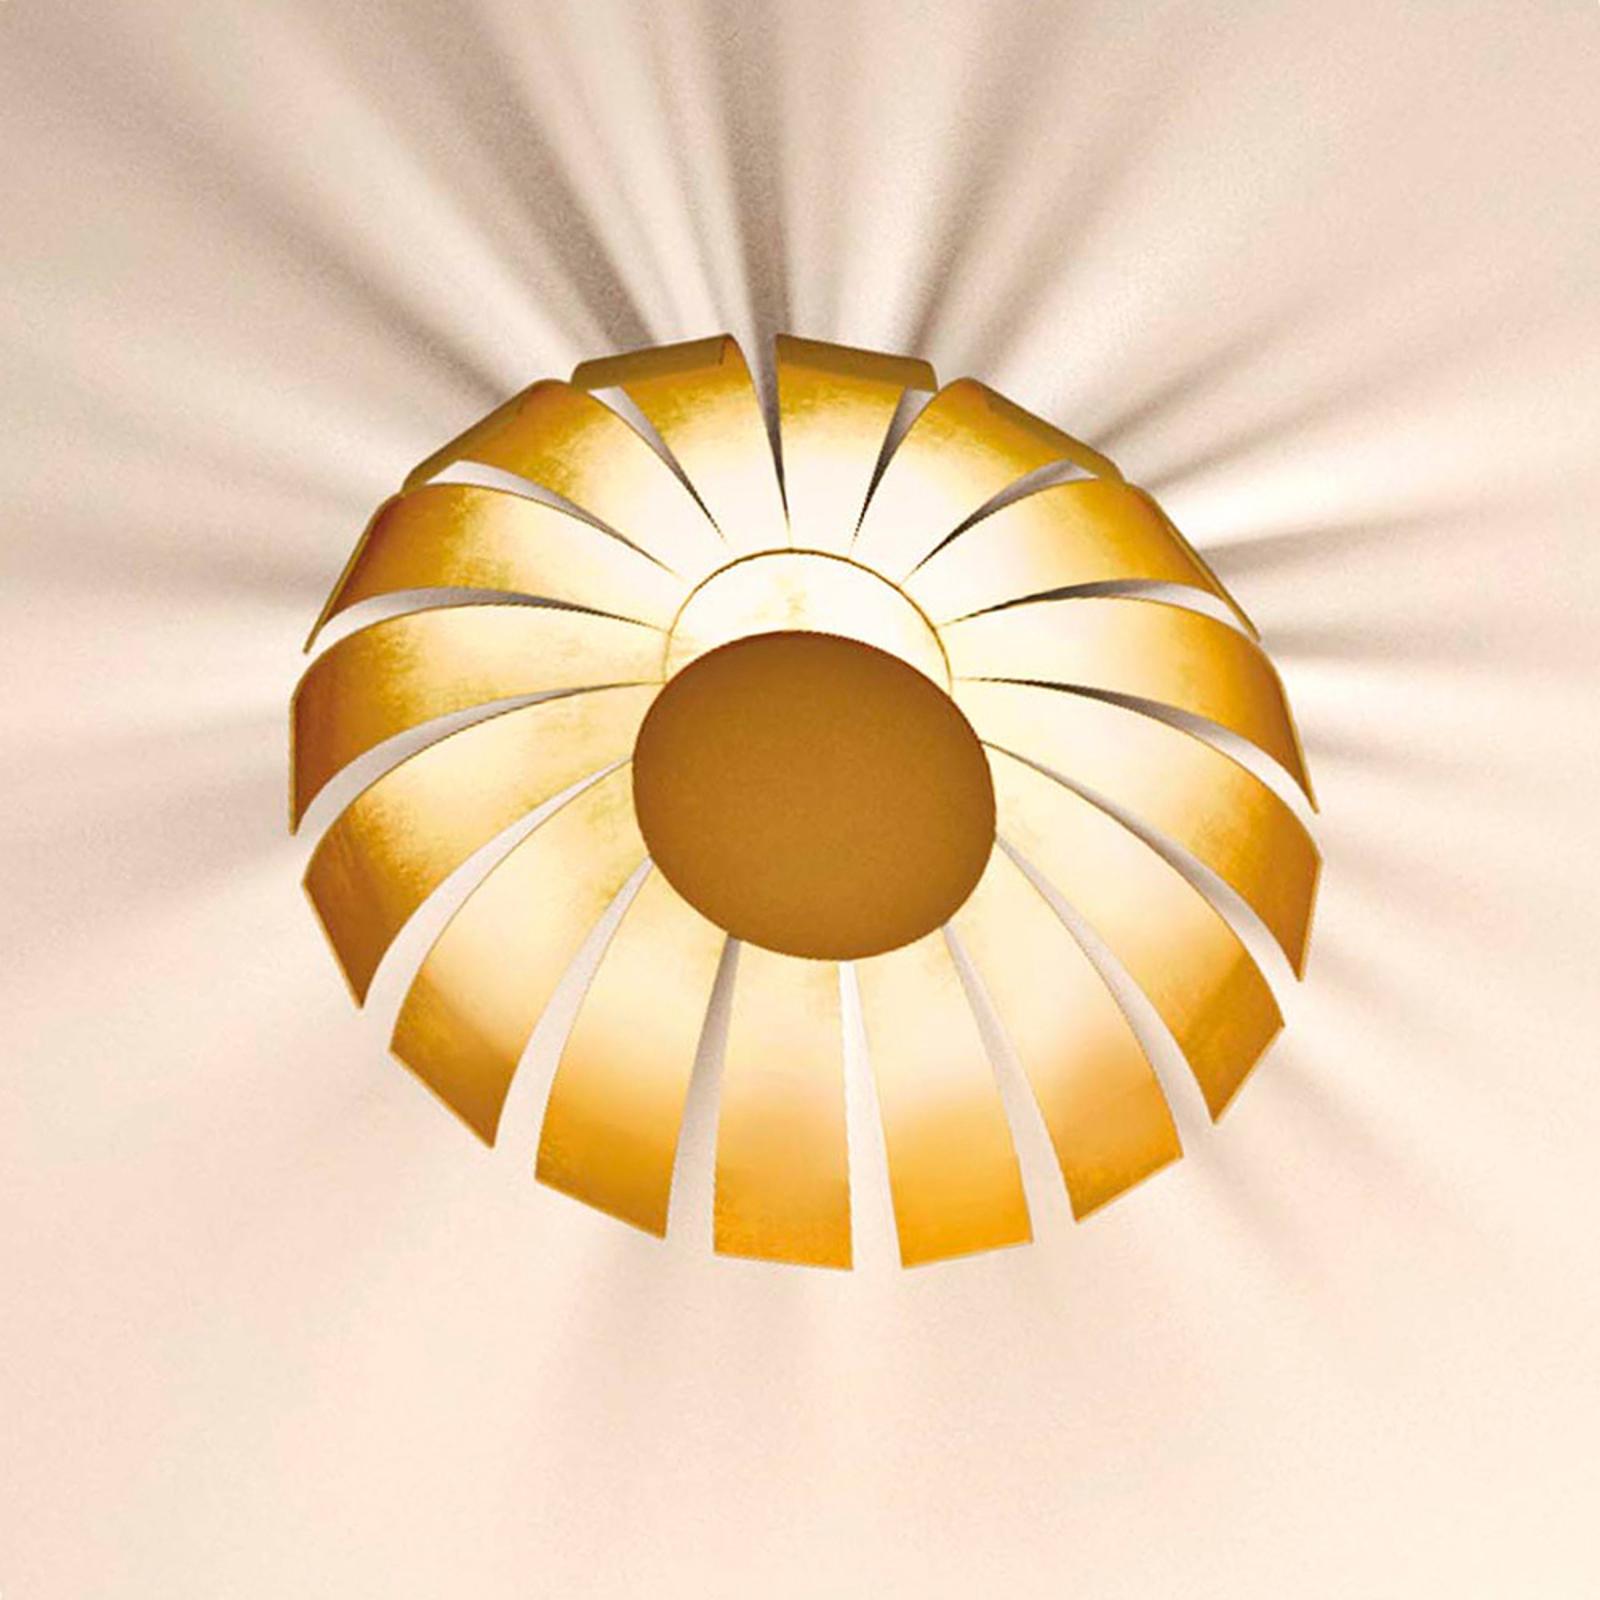 Pozłacana designerska lampa sufitowa LED Loto 20cm